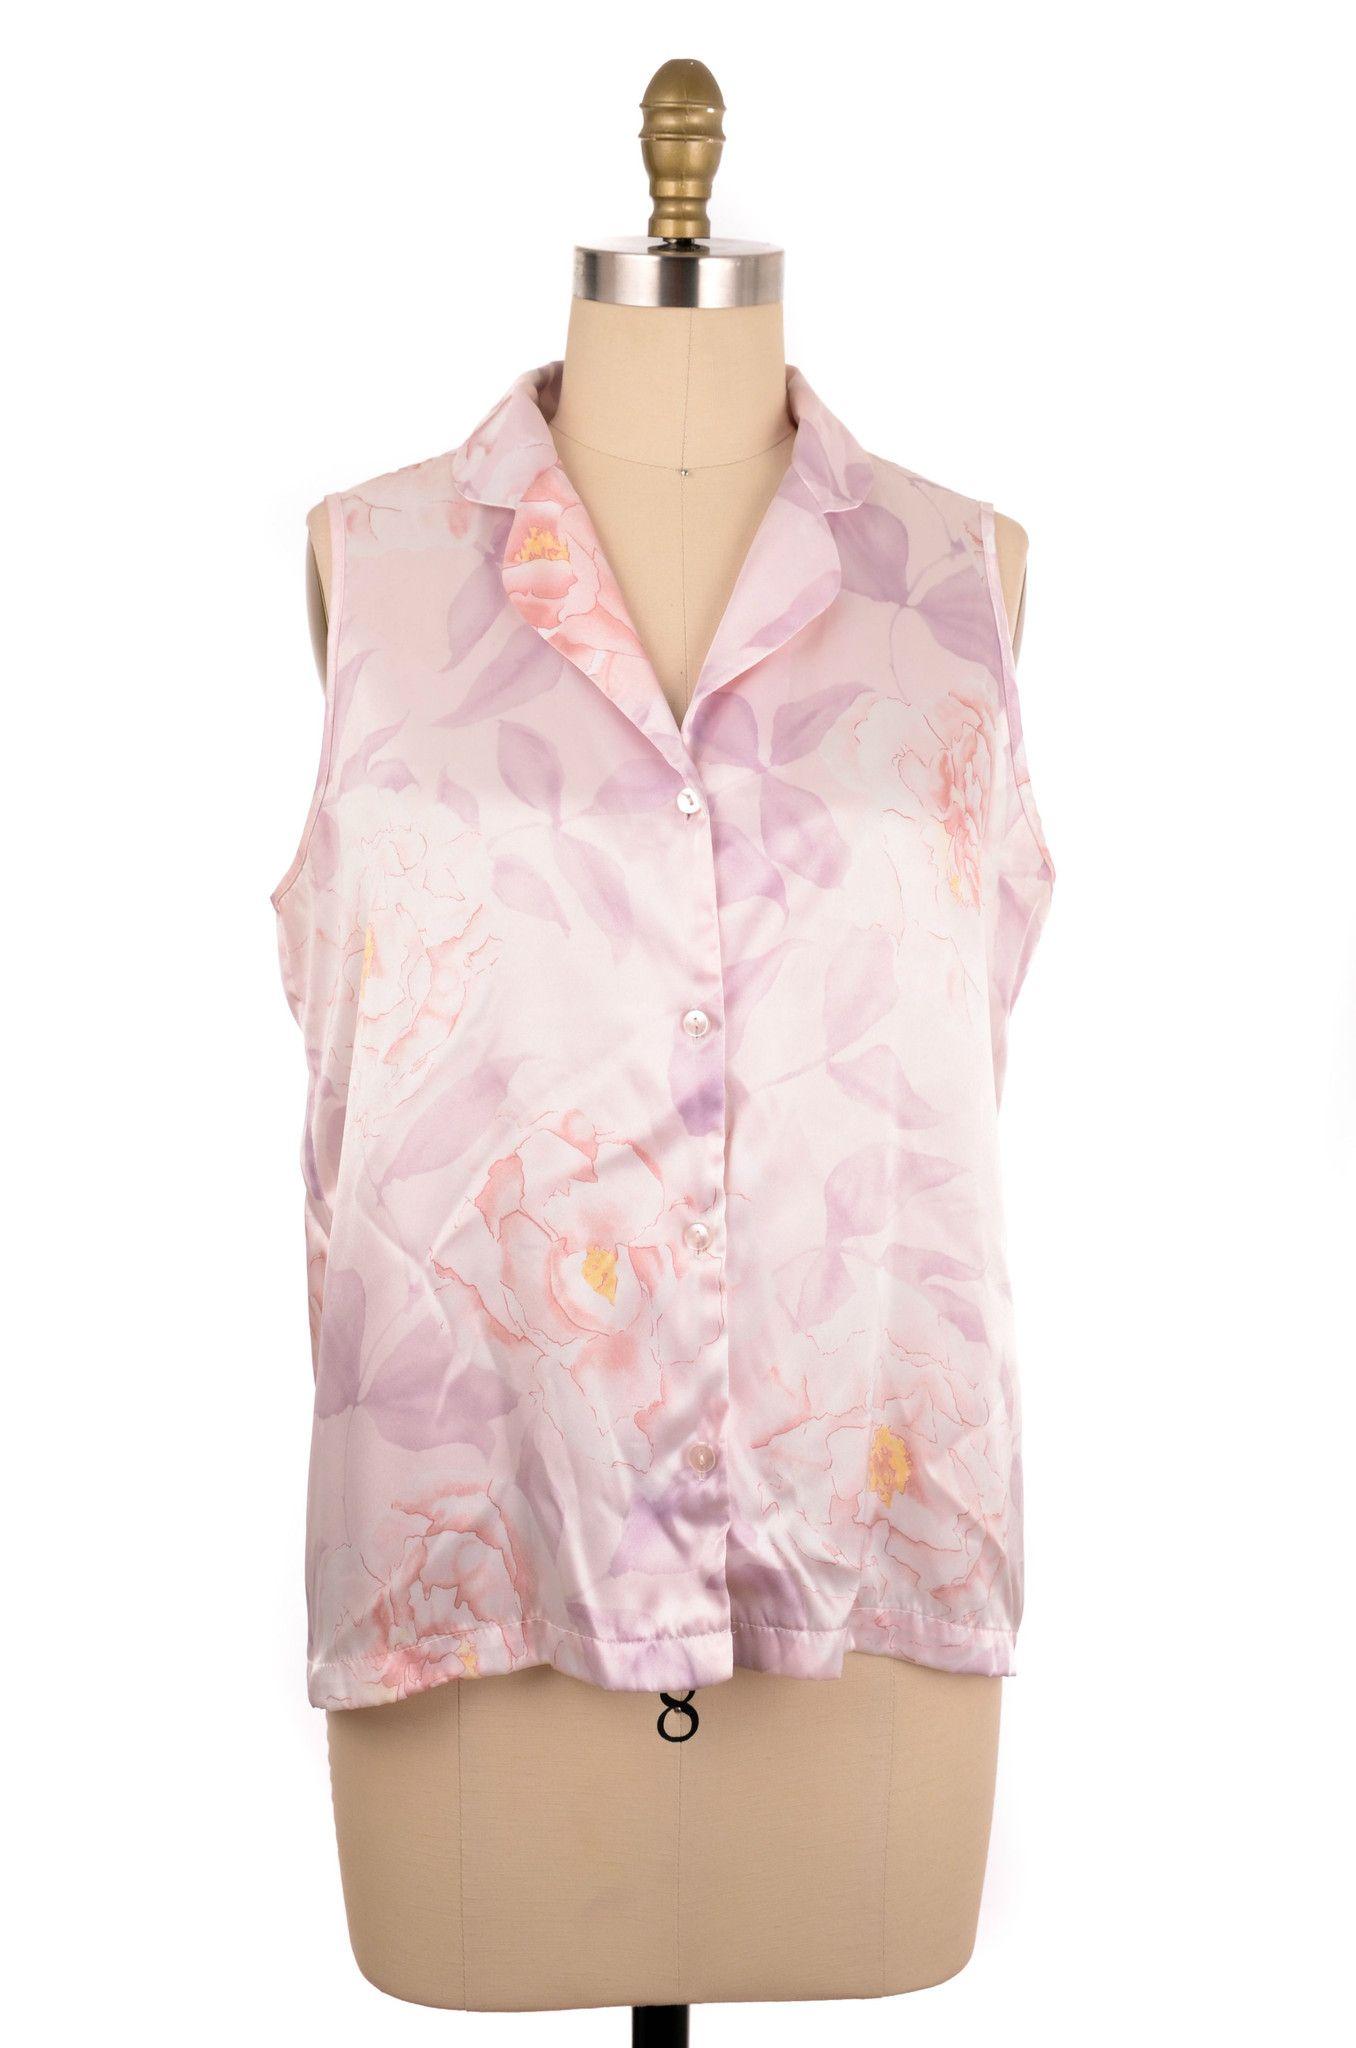 Jones New York Flower Print Blouse Size XL #fashion #style